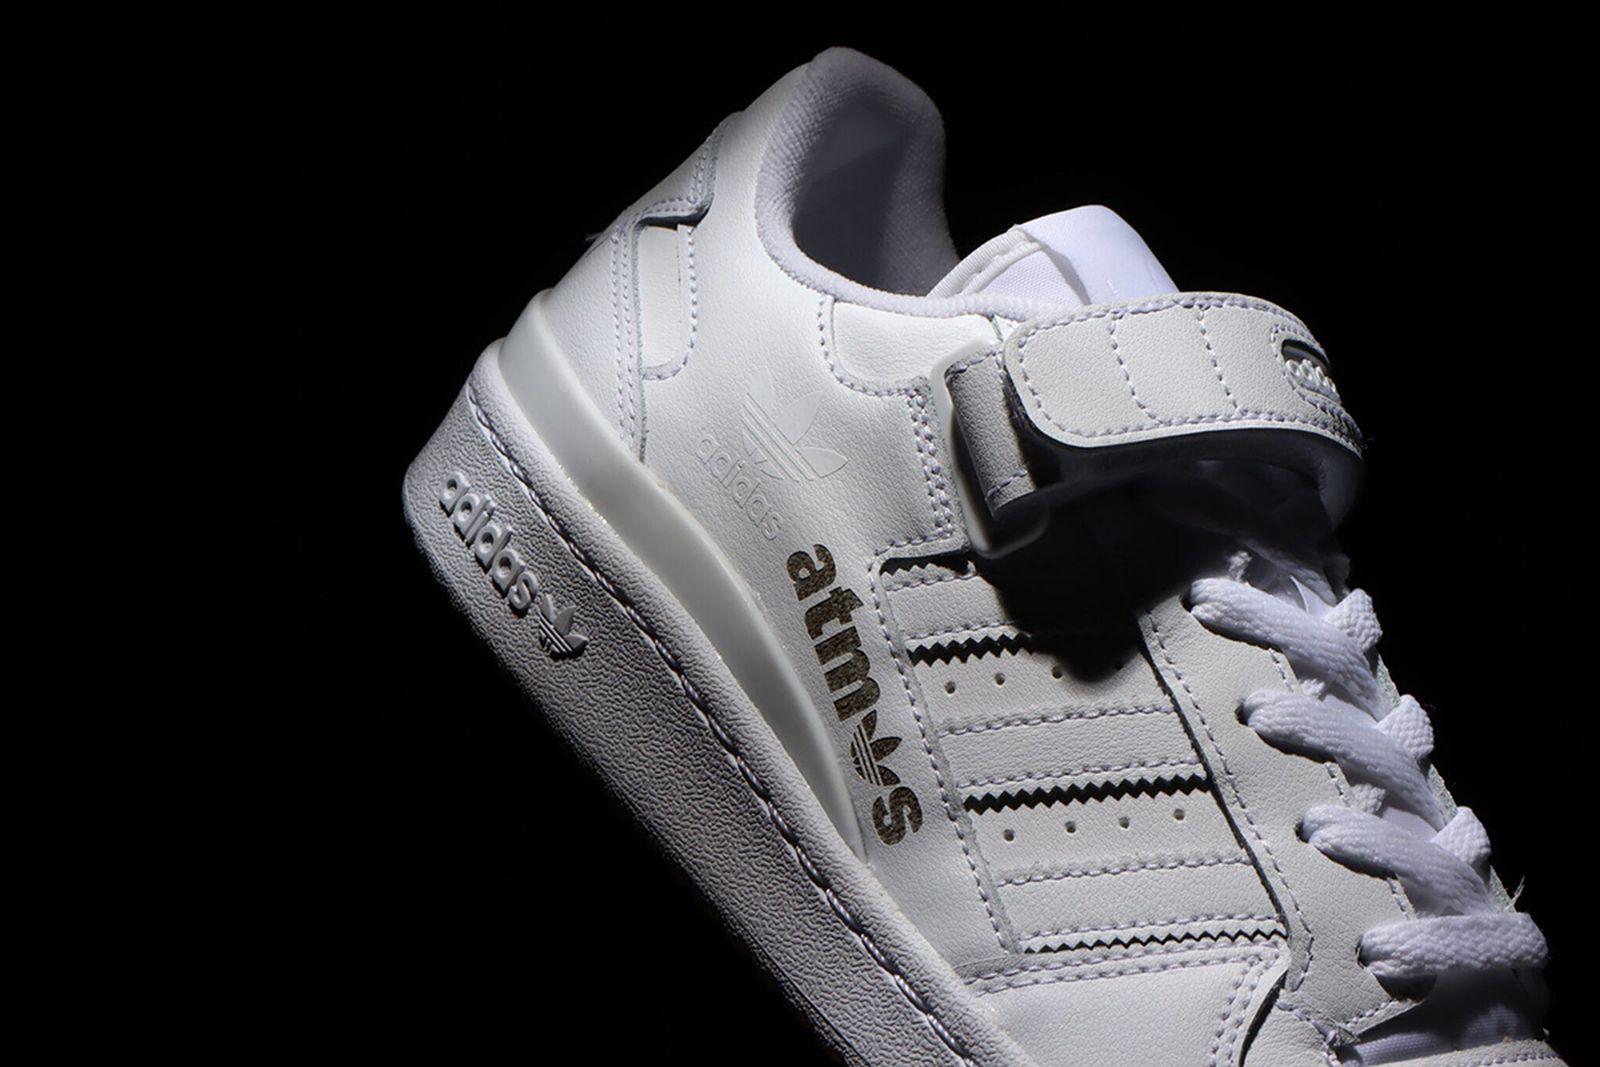 atmos-adidas-forum-low-release-info-03